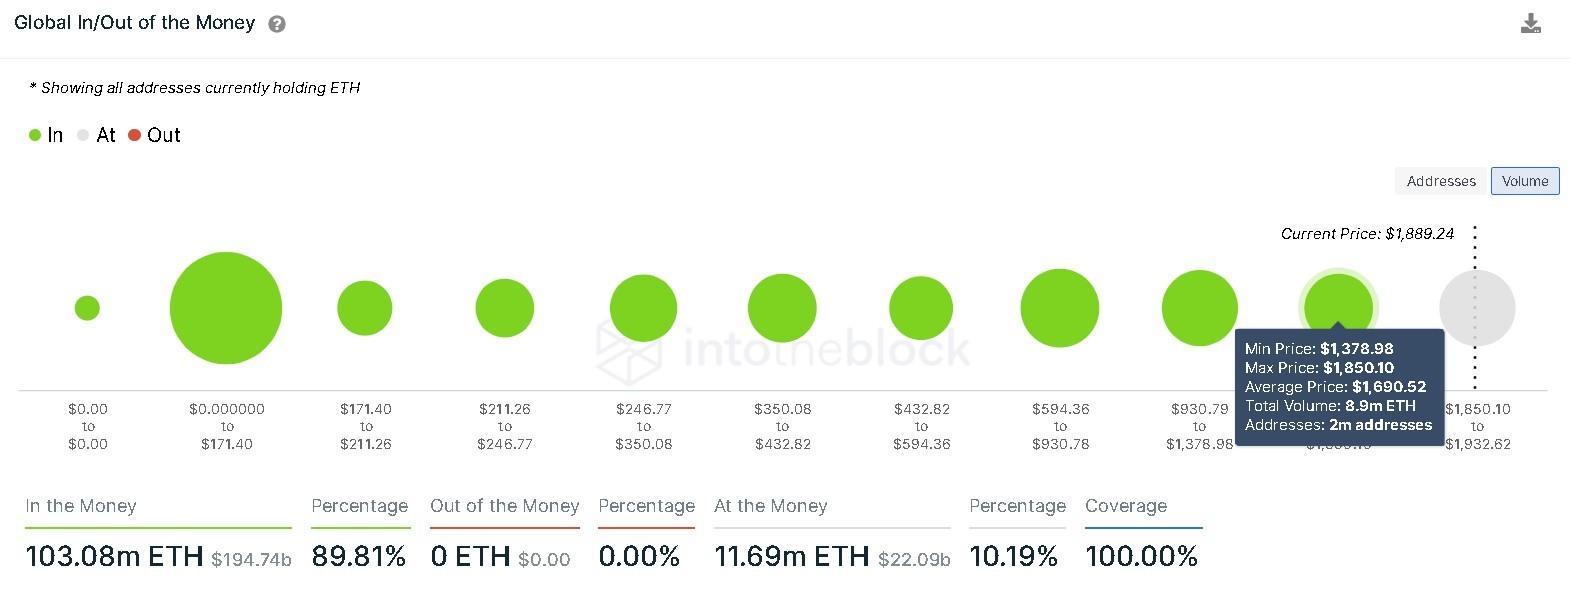 Ethereum GIOM chart